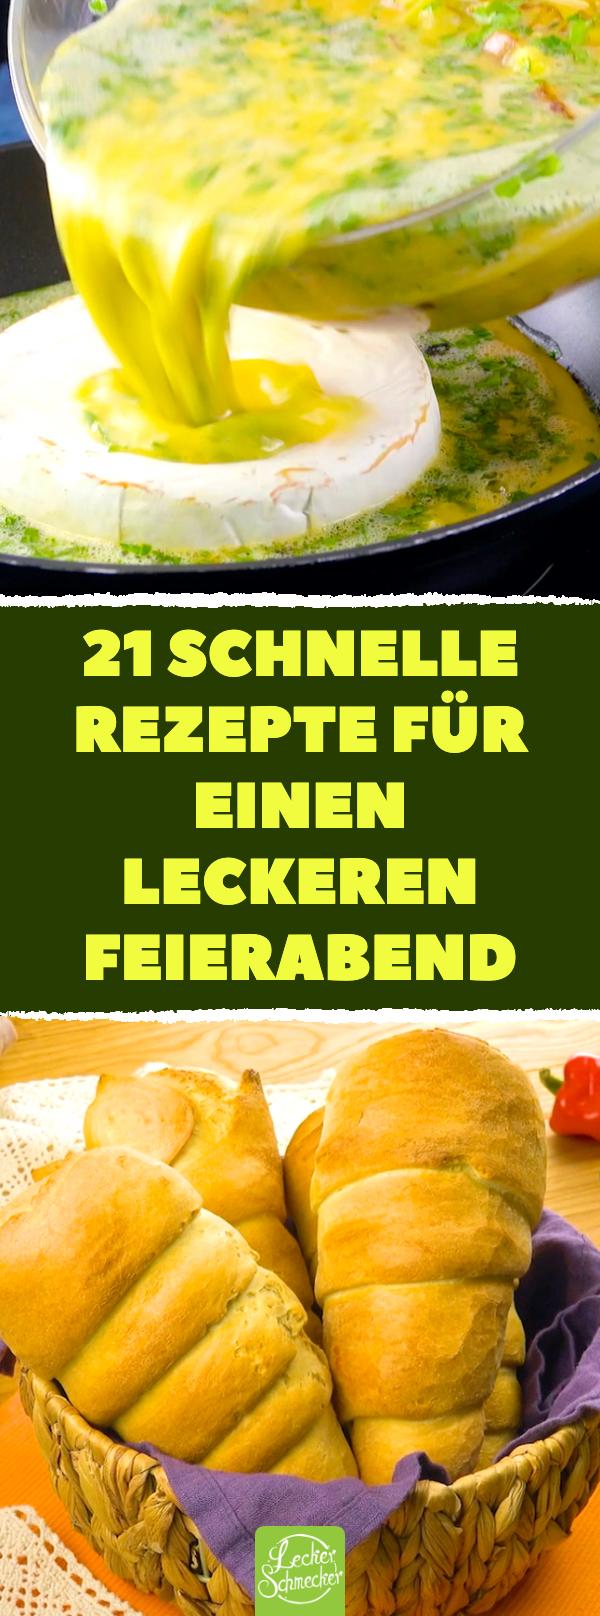 7e29f58dbd1726812efa12a3afc9c1be - Leckere Schnelle Rezepte